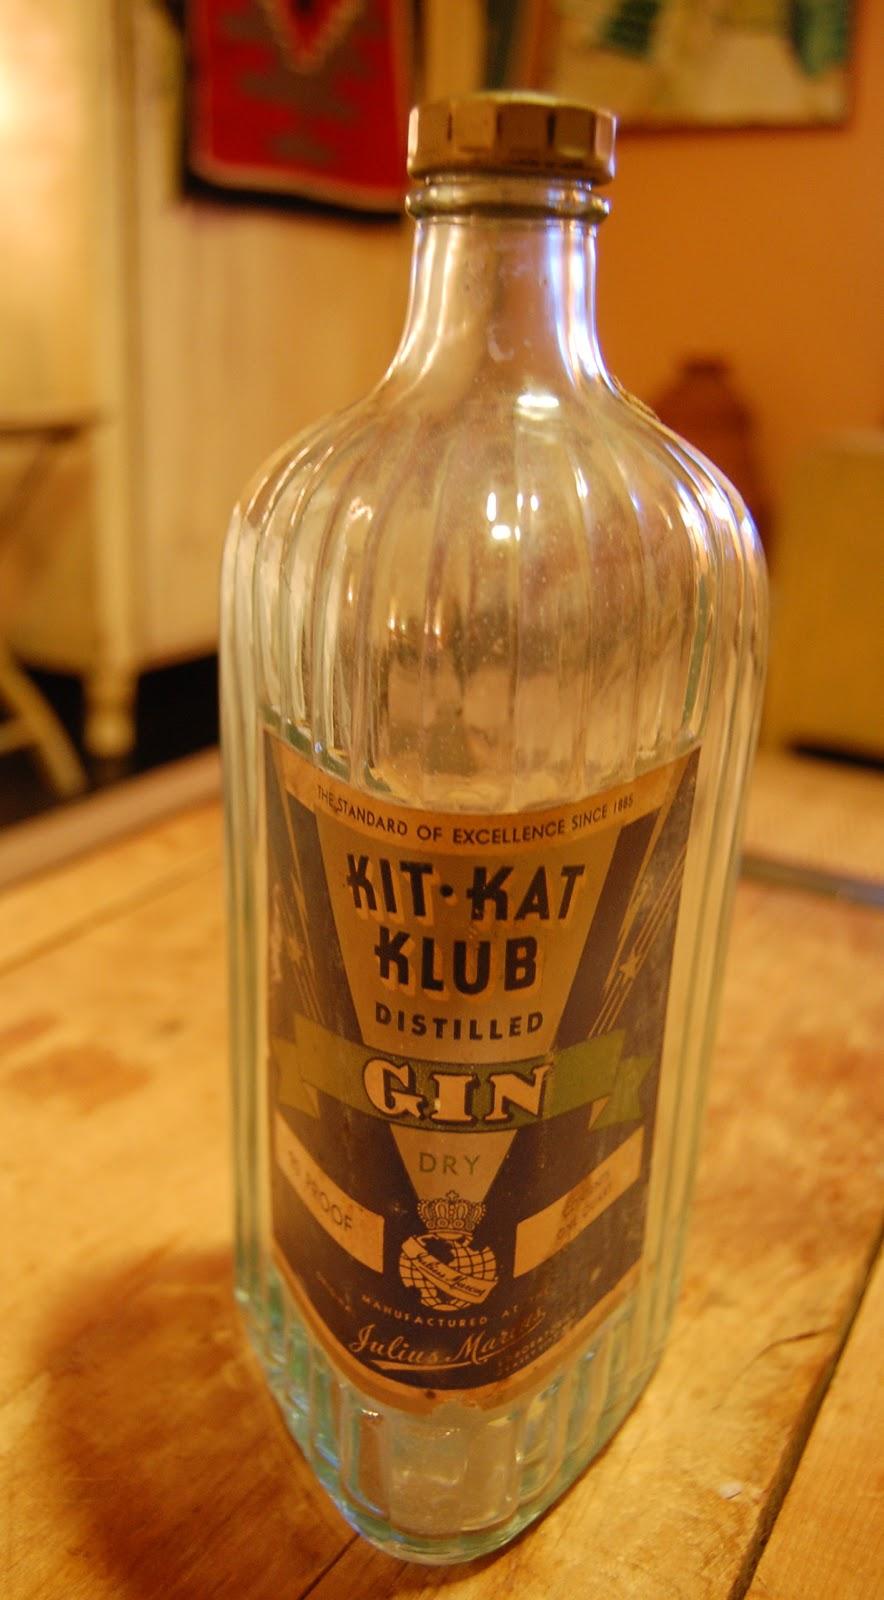 Wunderful Things Kit Kat Club Gin Art Deco Liquor Bottle